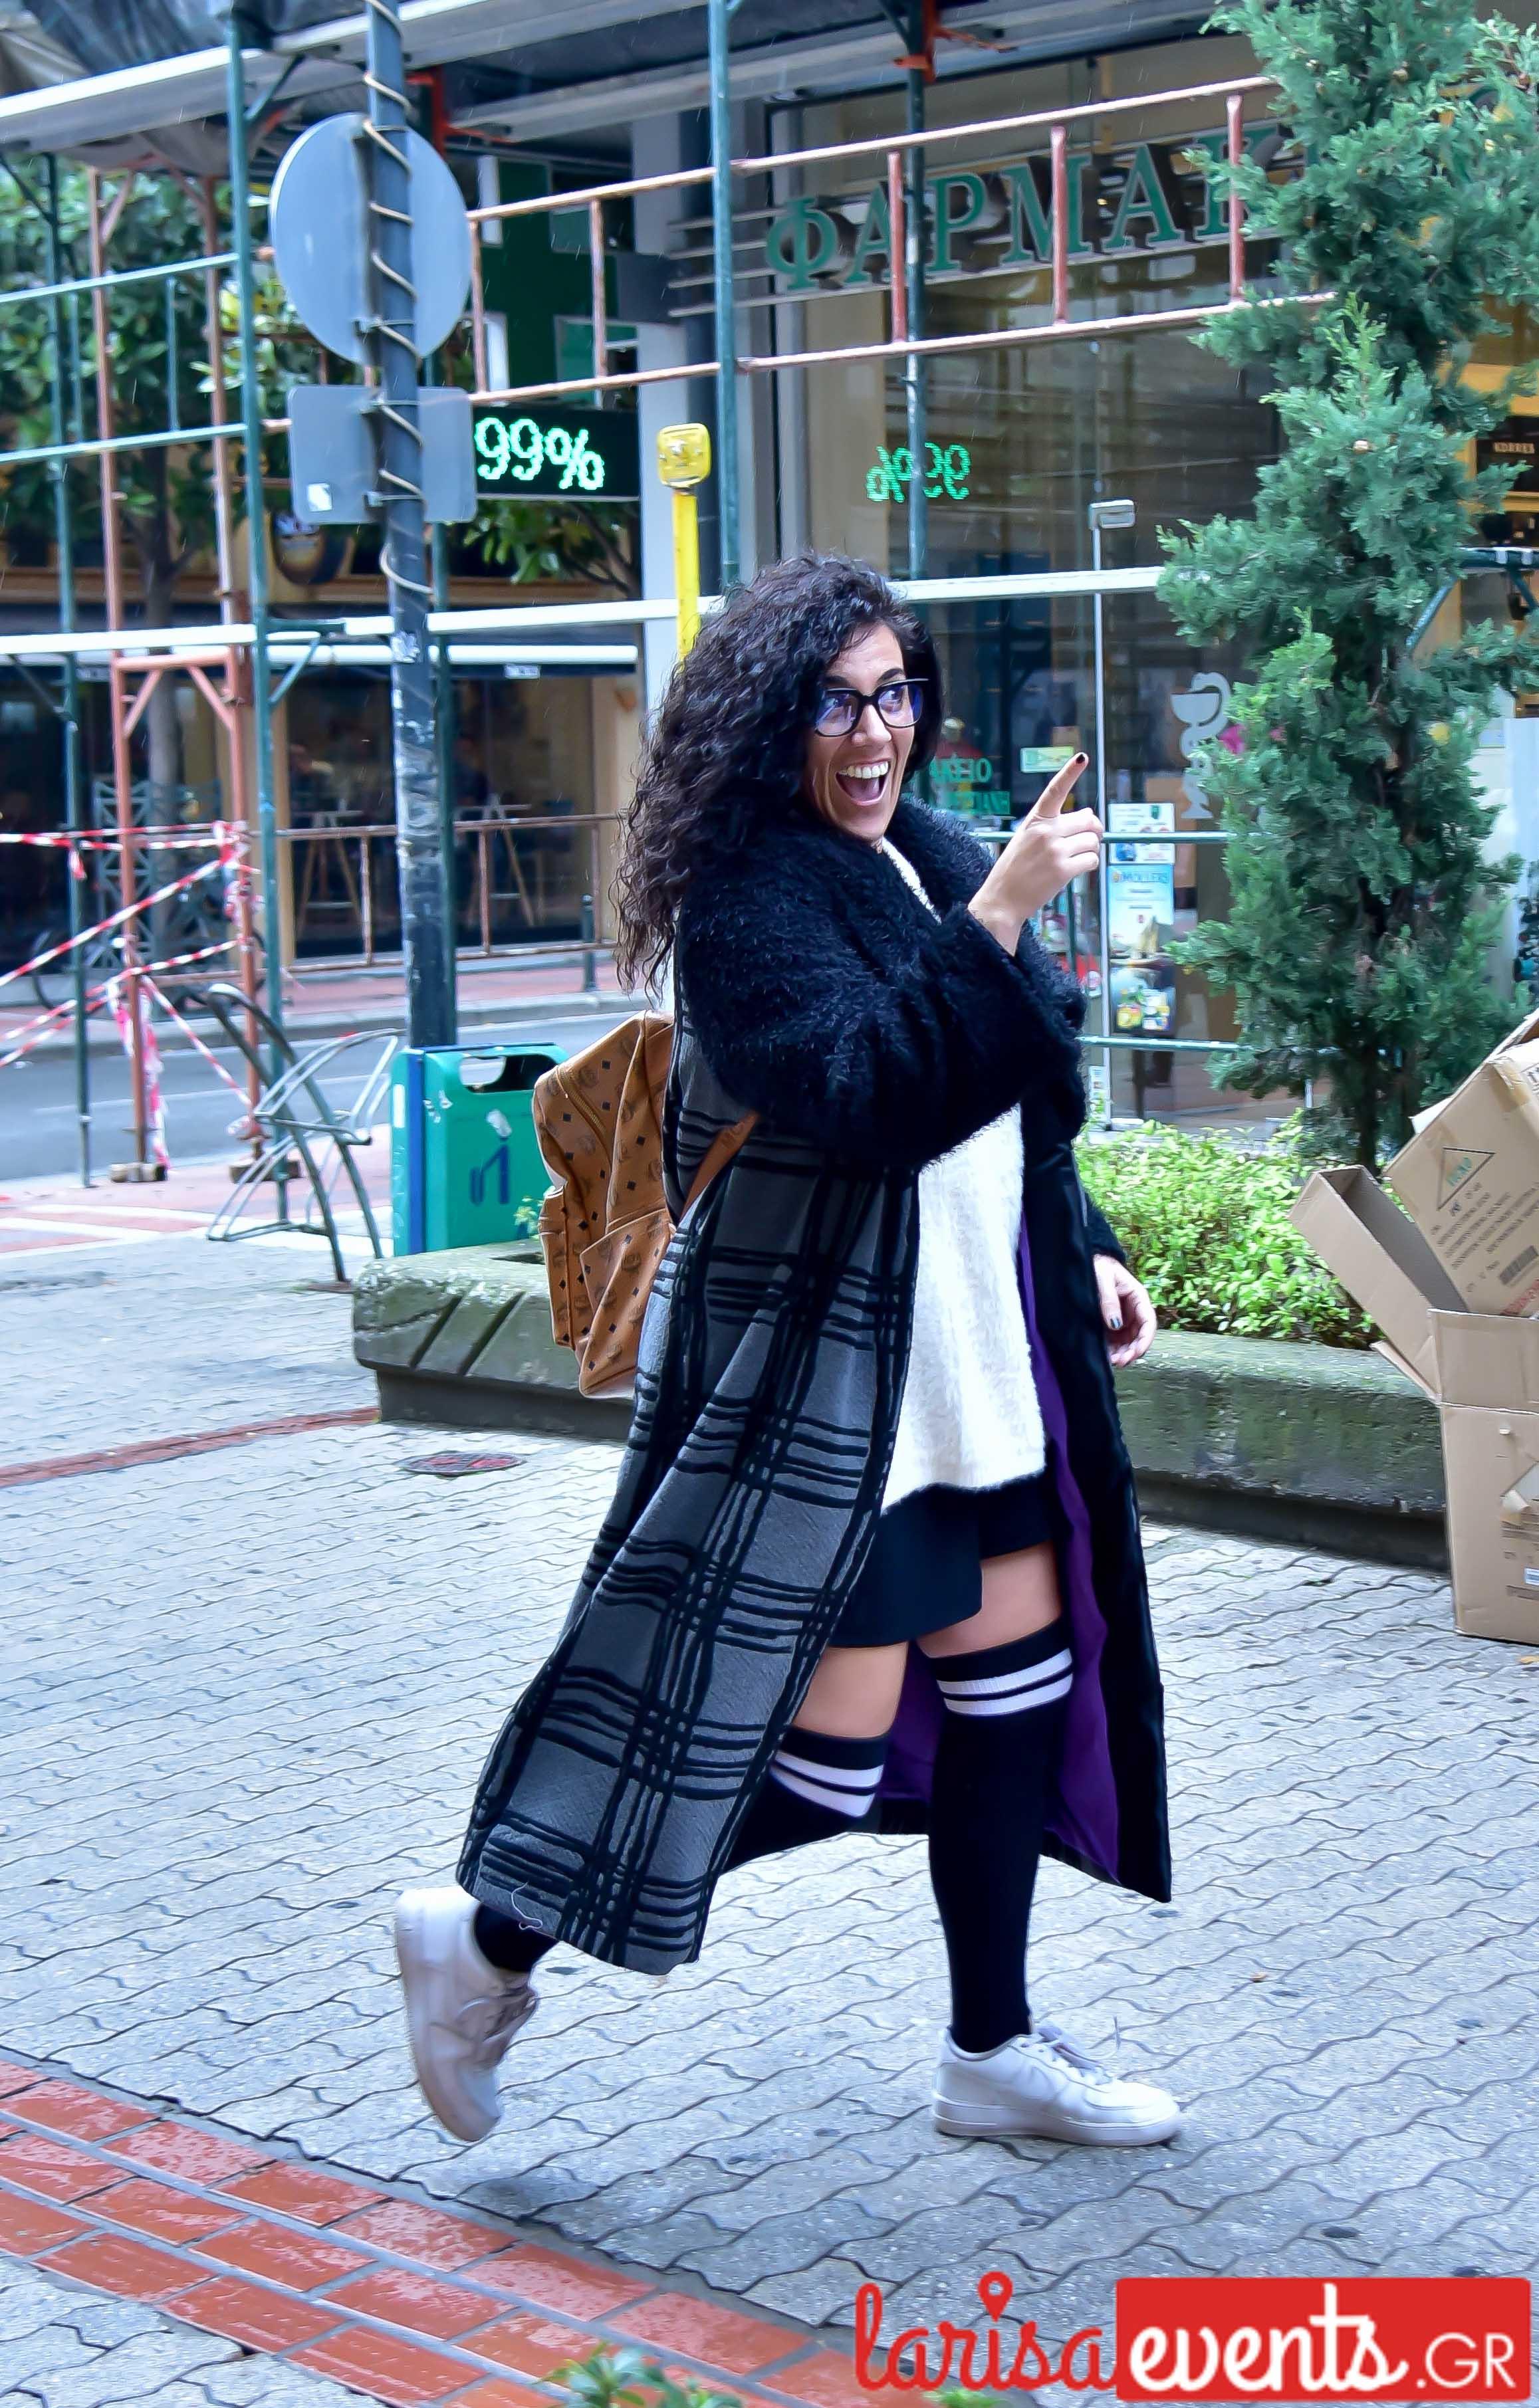 LAZ 6726 - Λάρισα's Street Style | Οι Λαρισαίοι σε street style clicks!